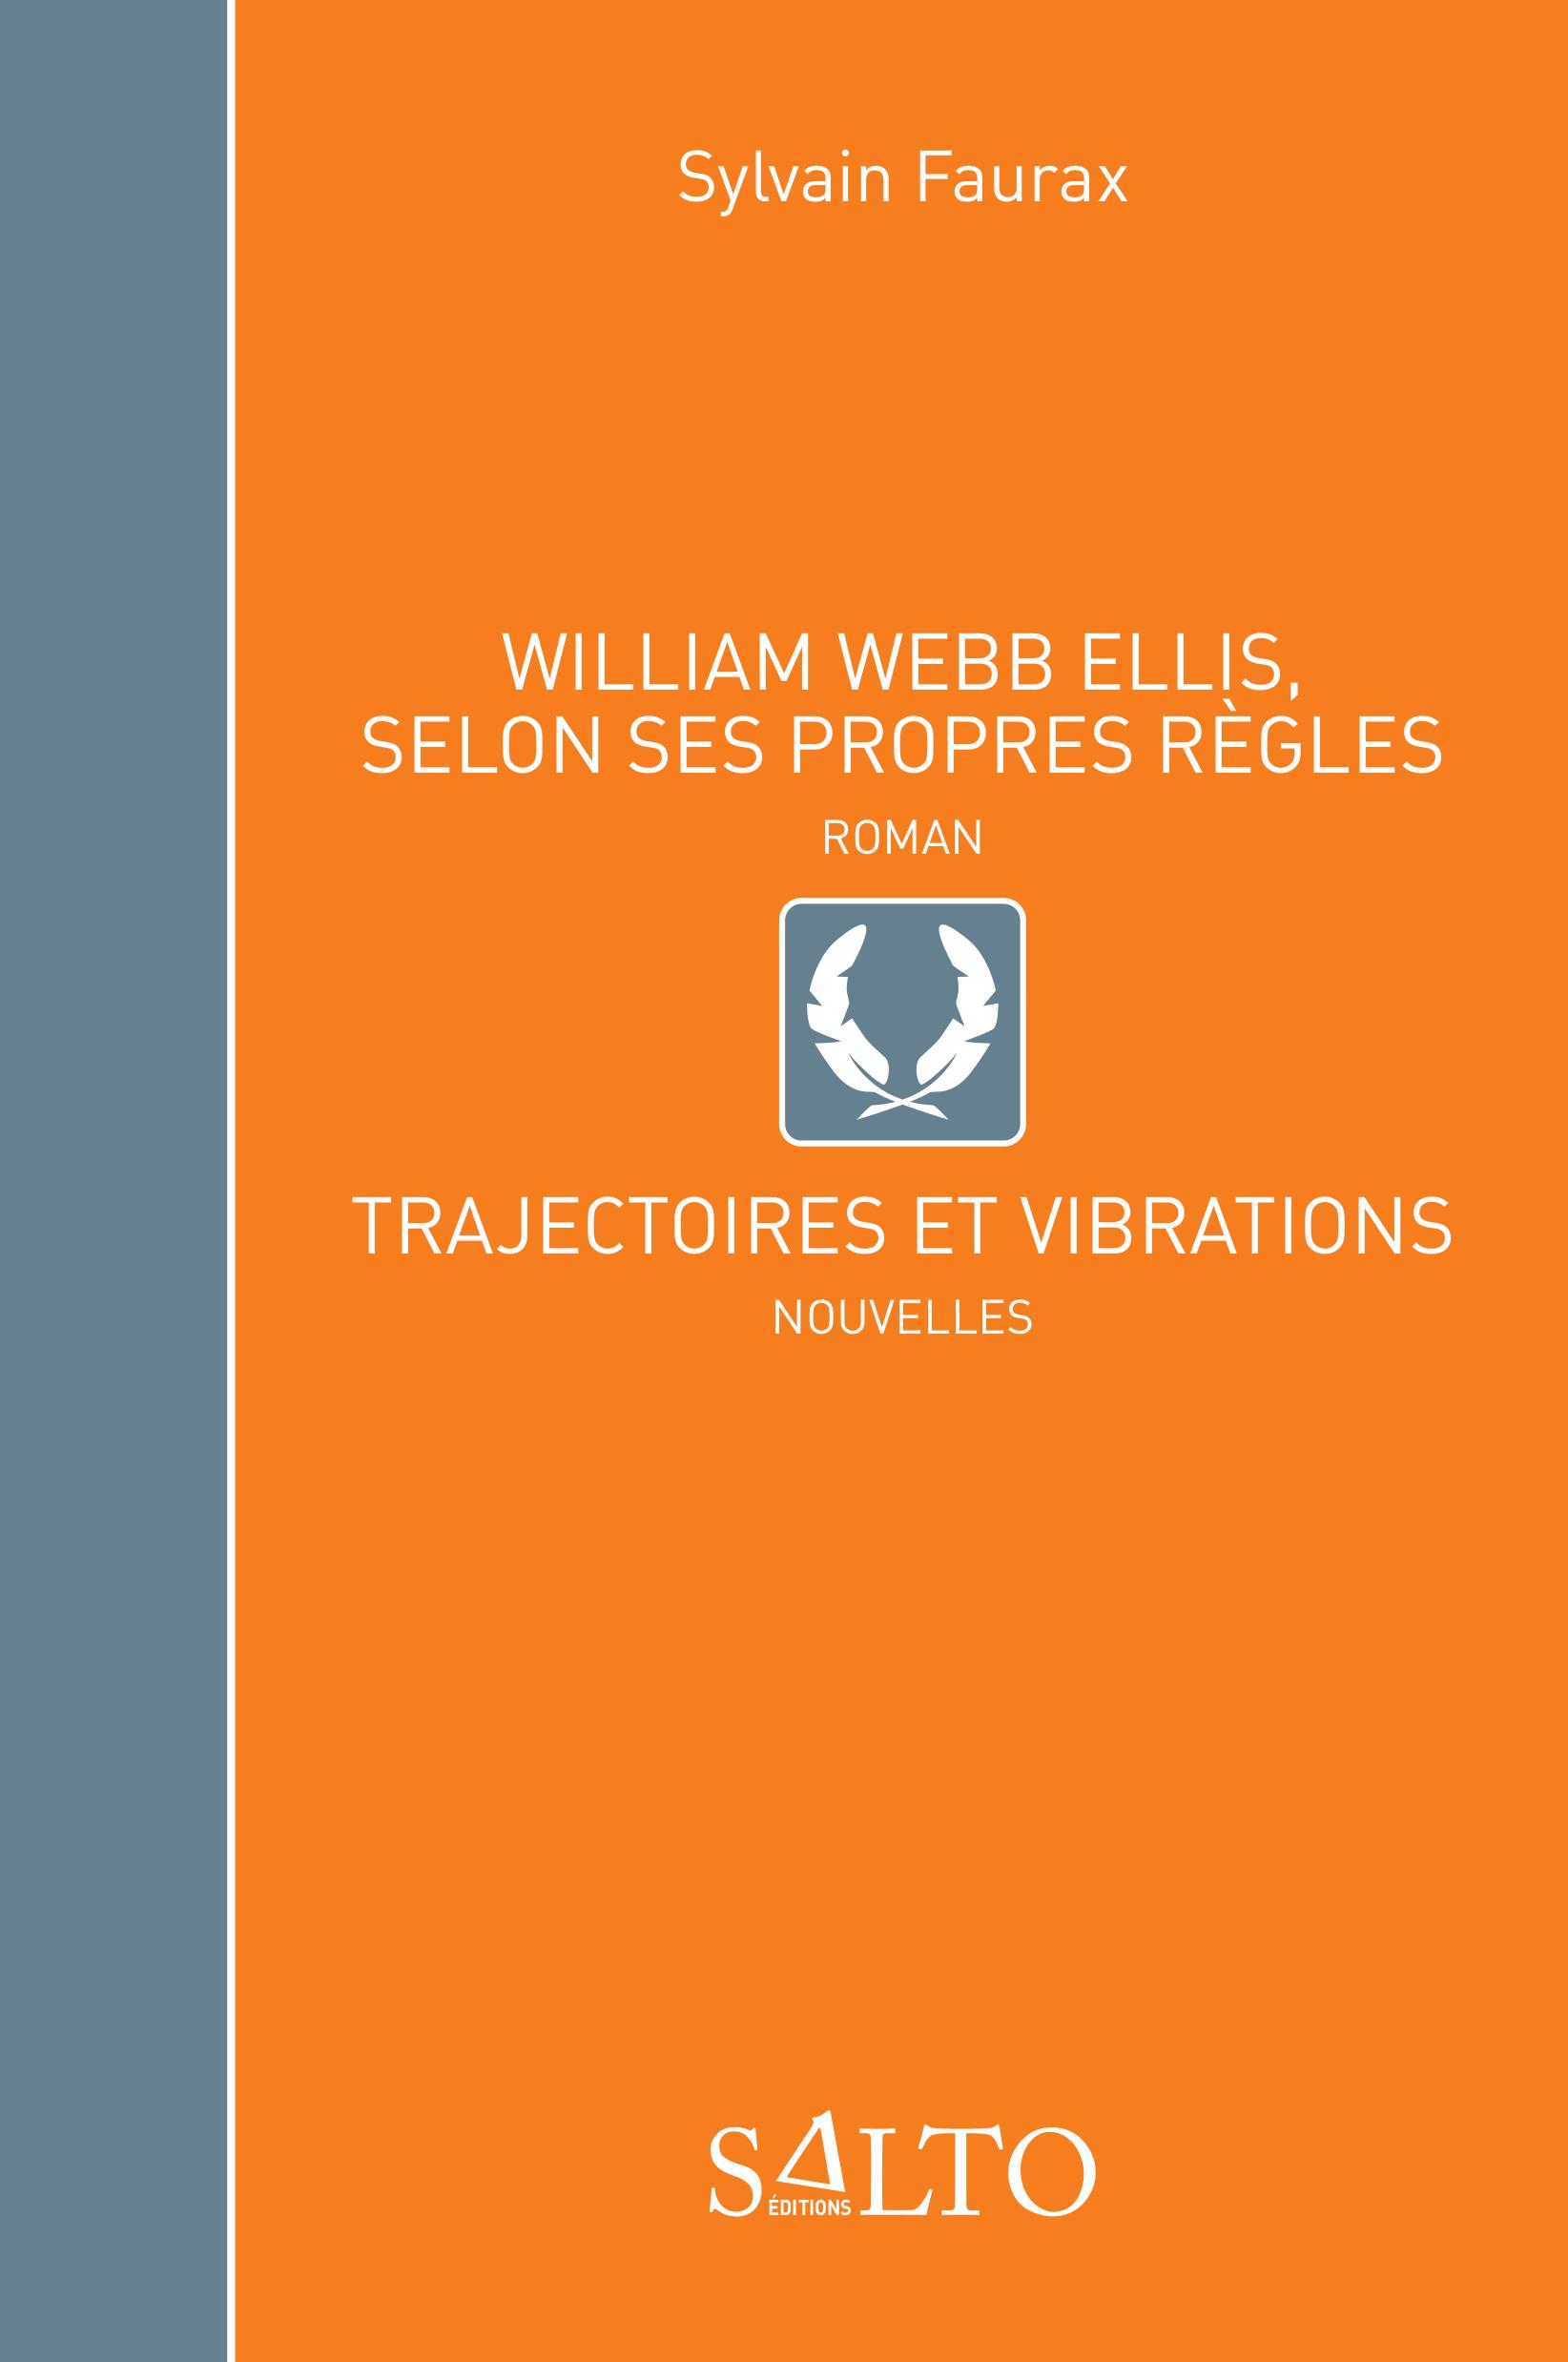 WILLIAM WEBB ELLIS, SELON SES PROPRES REGLES